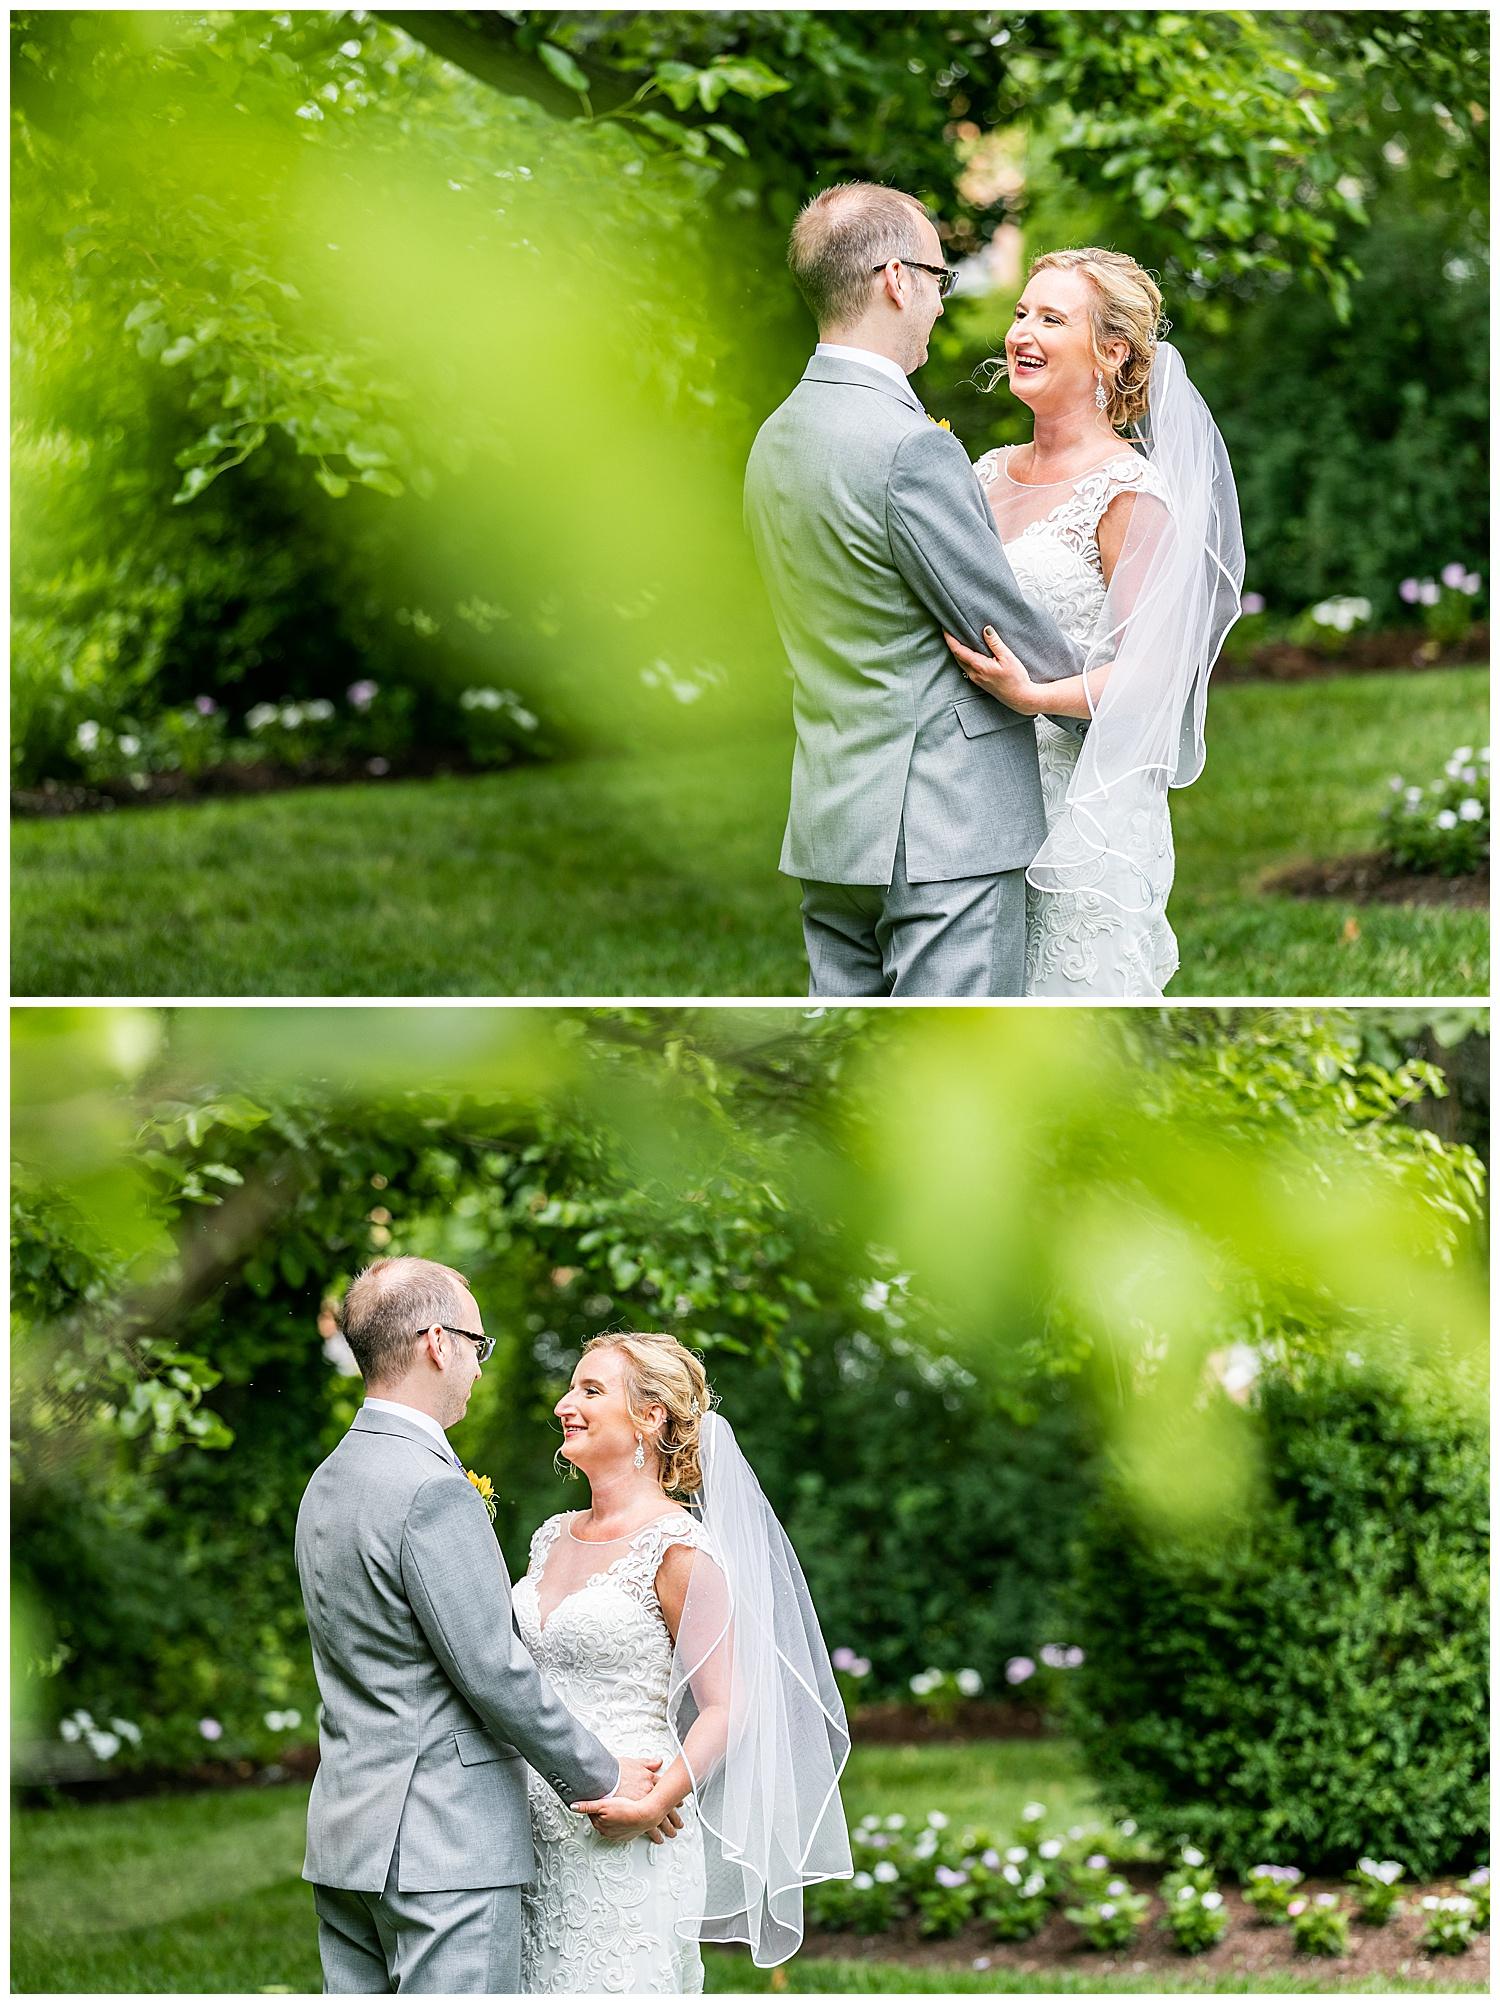 Michelle Shaun Antrim 1844 Wedding Living Radiant Photography photos_0037.jpg